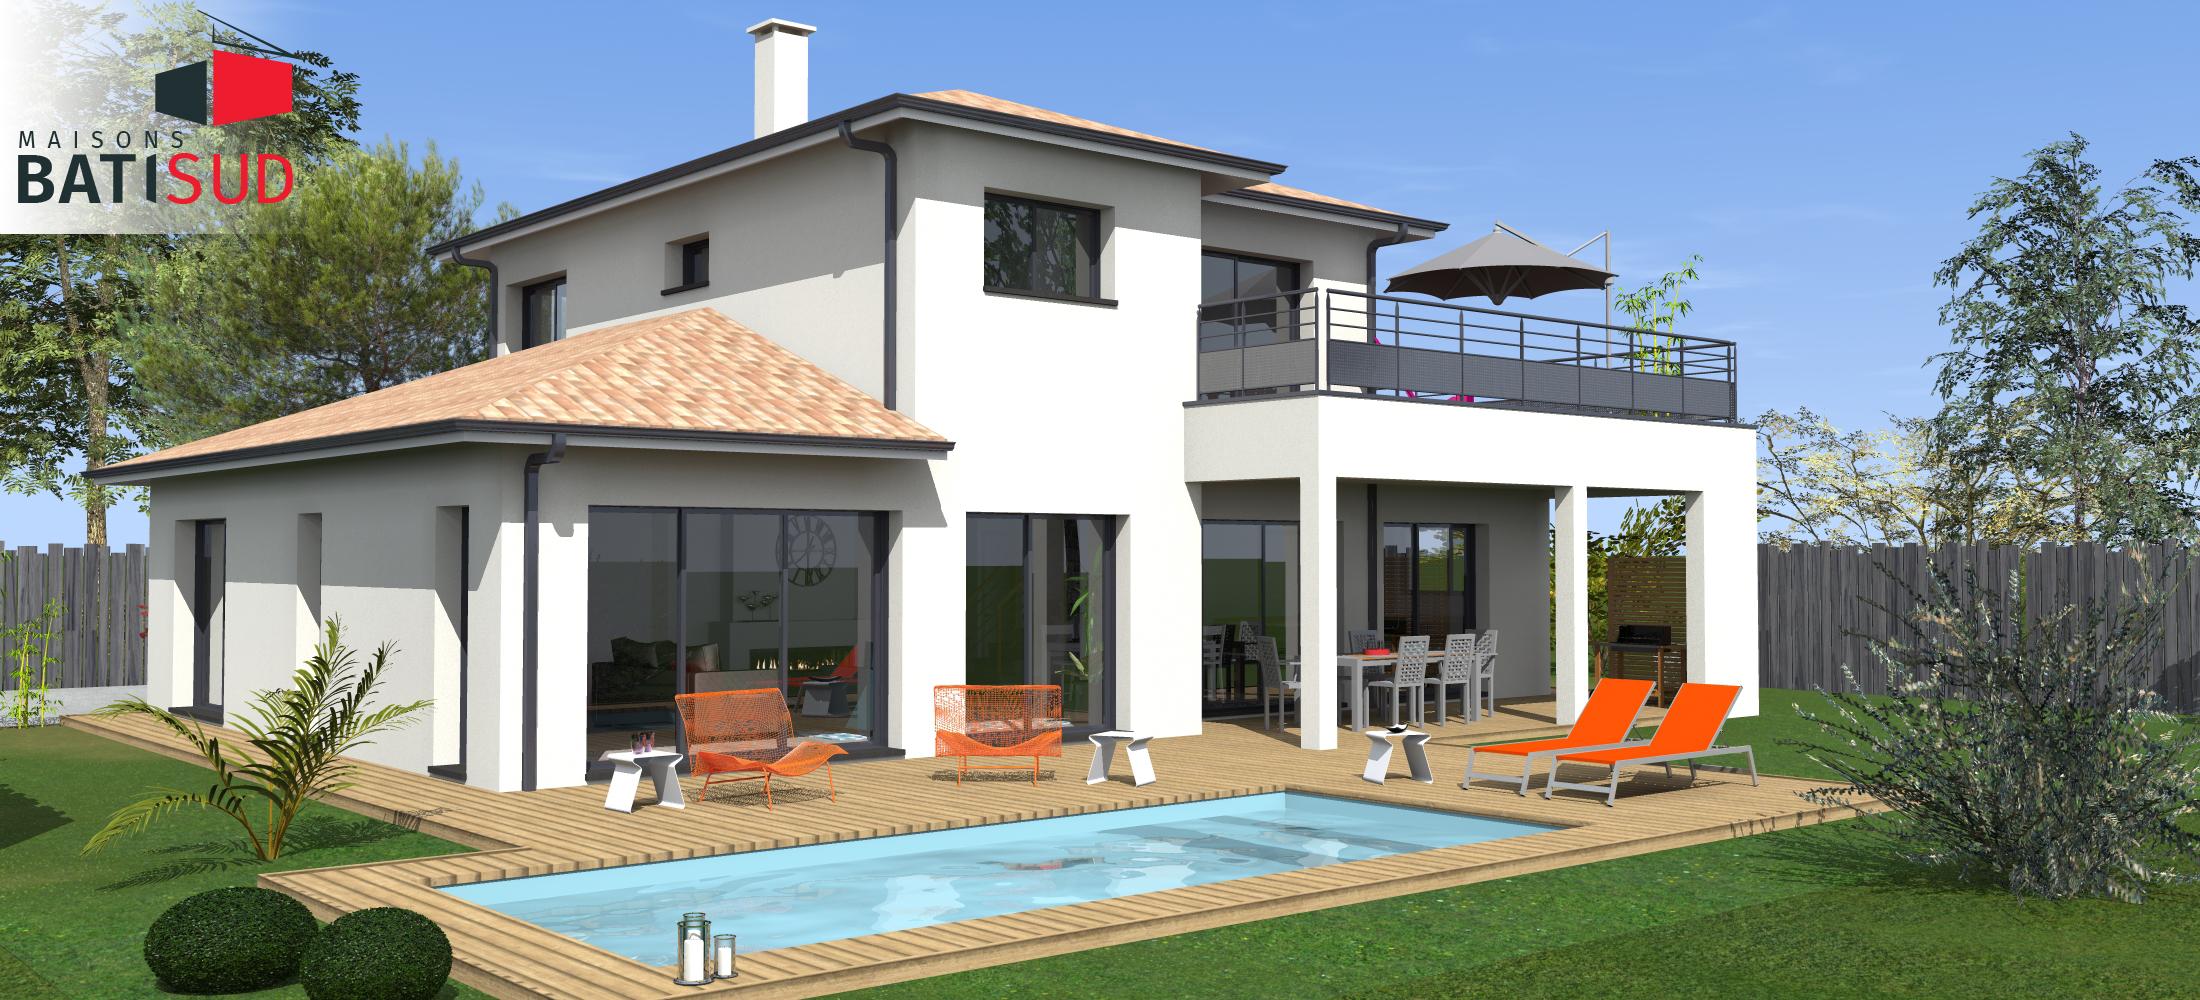 bati-sud-maginifique-maison-moderne-solarium-terrasse-couverte ...